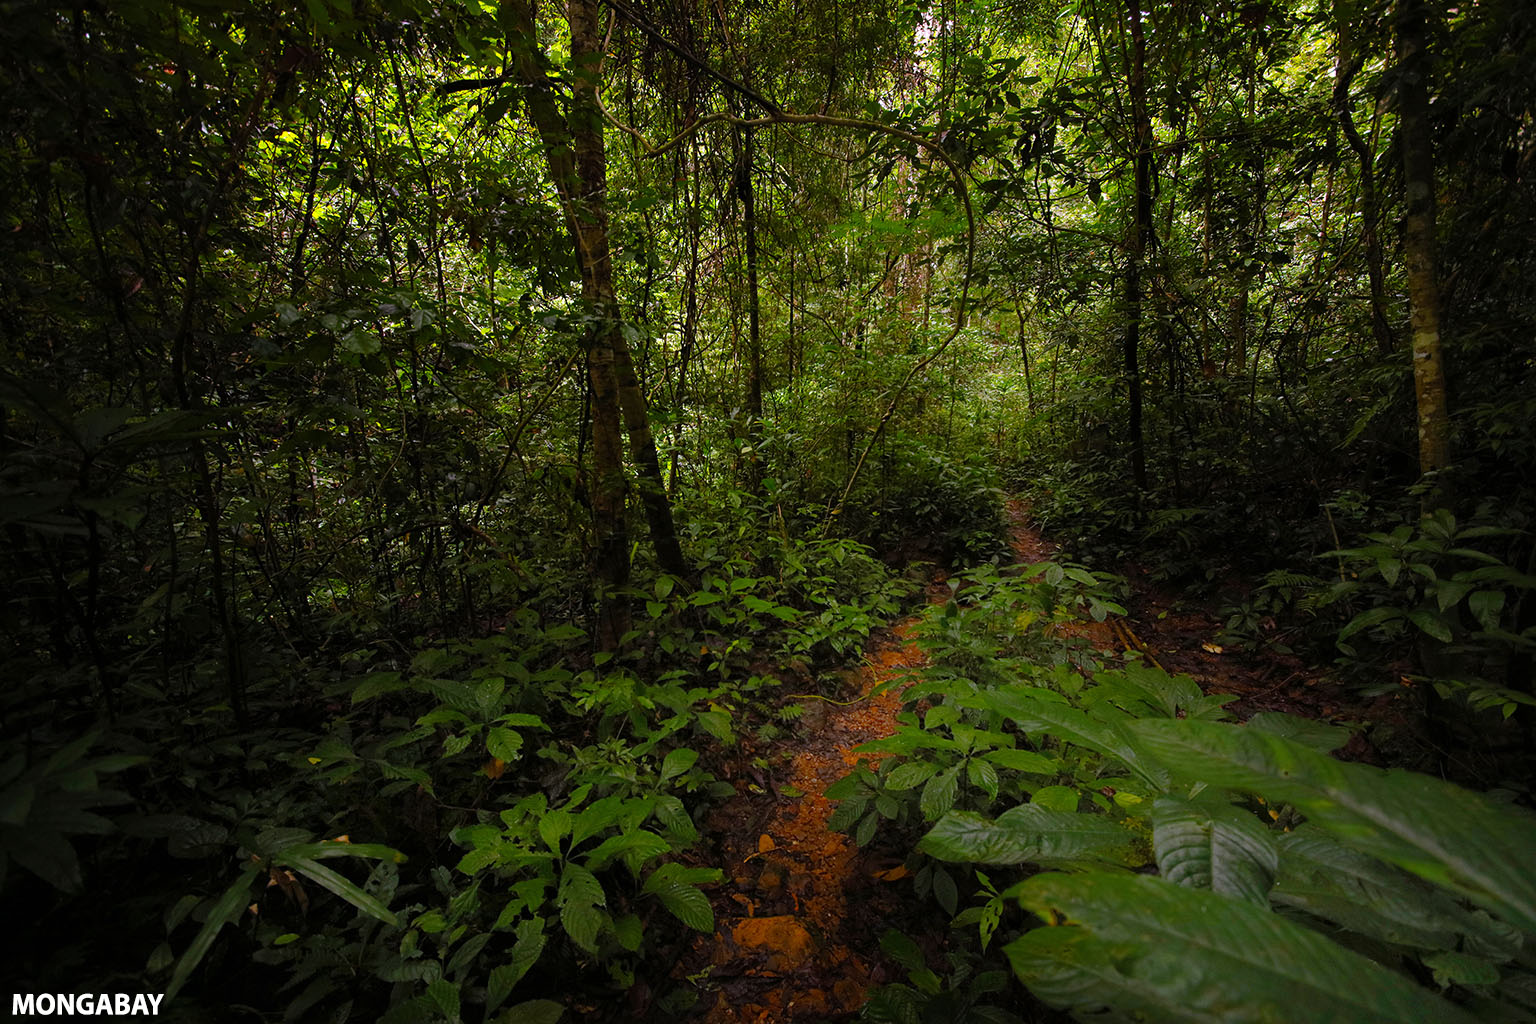 Rainforest in Southern China. Photo credit: Rhett A. Butler